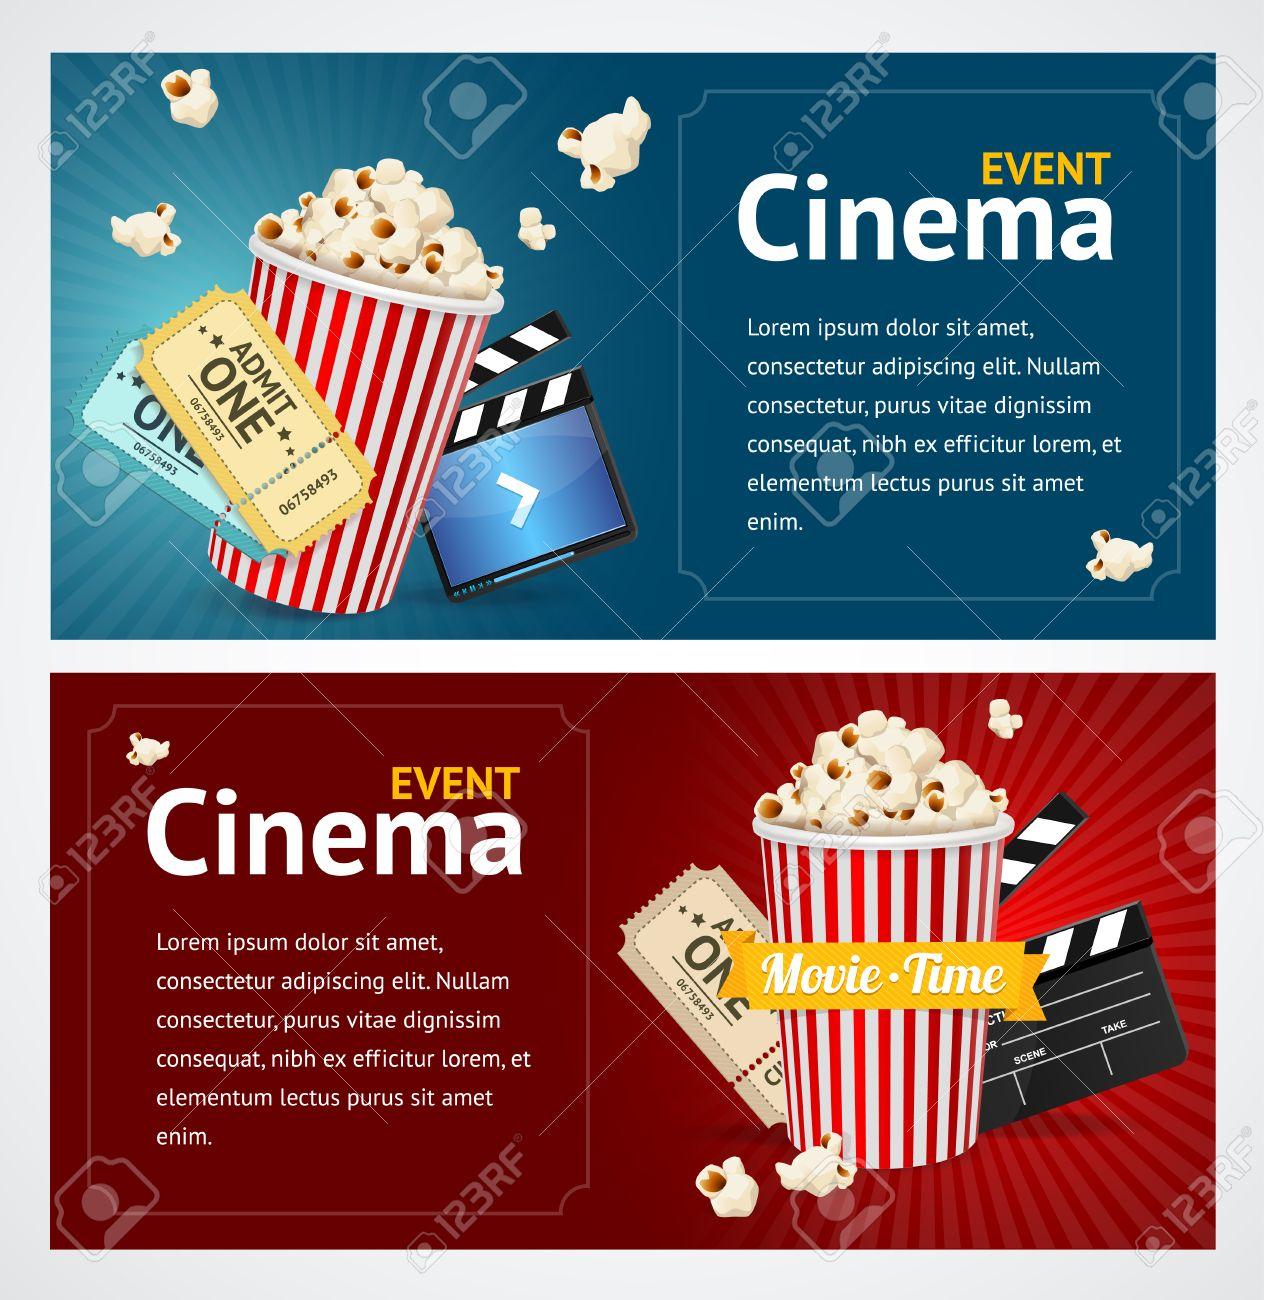 Realistic Cinema Movie Poster Template. Horizontal Set. Vector illustration - 46106114